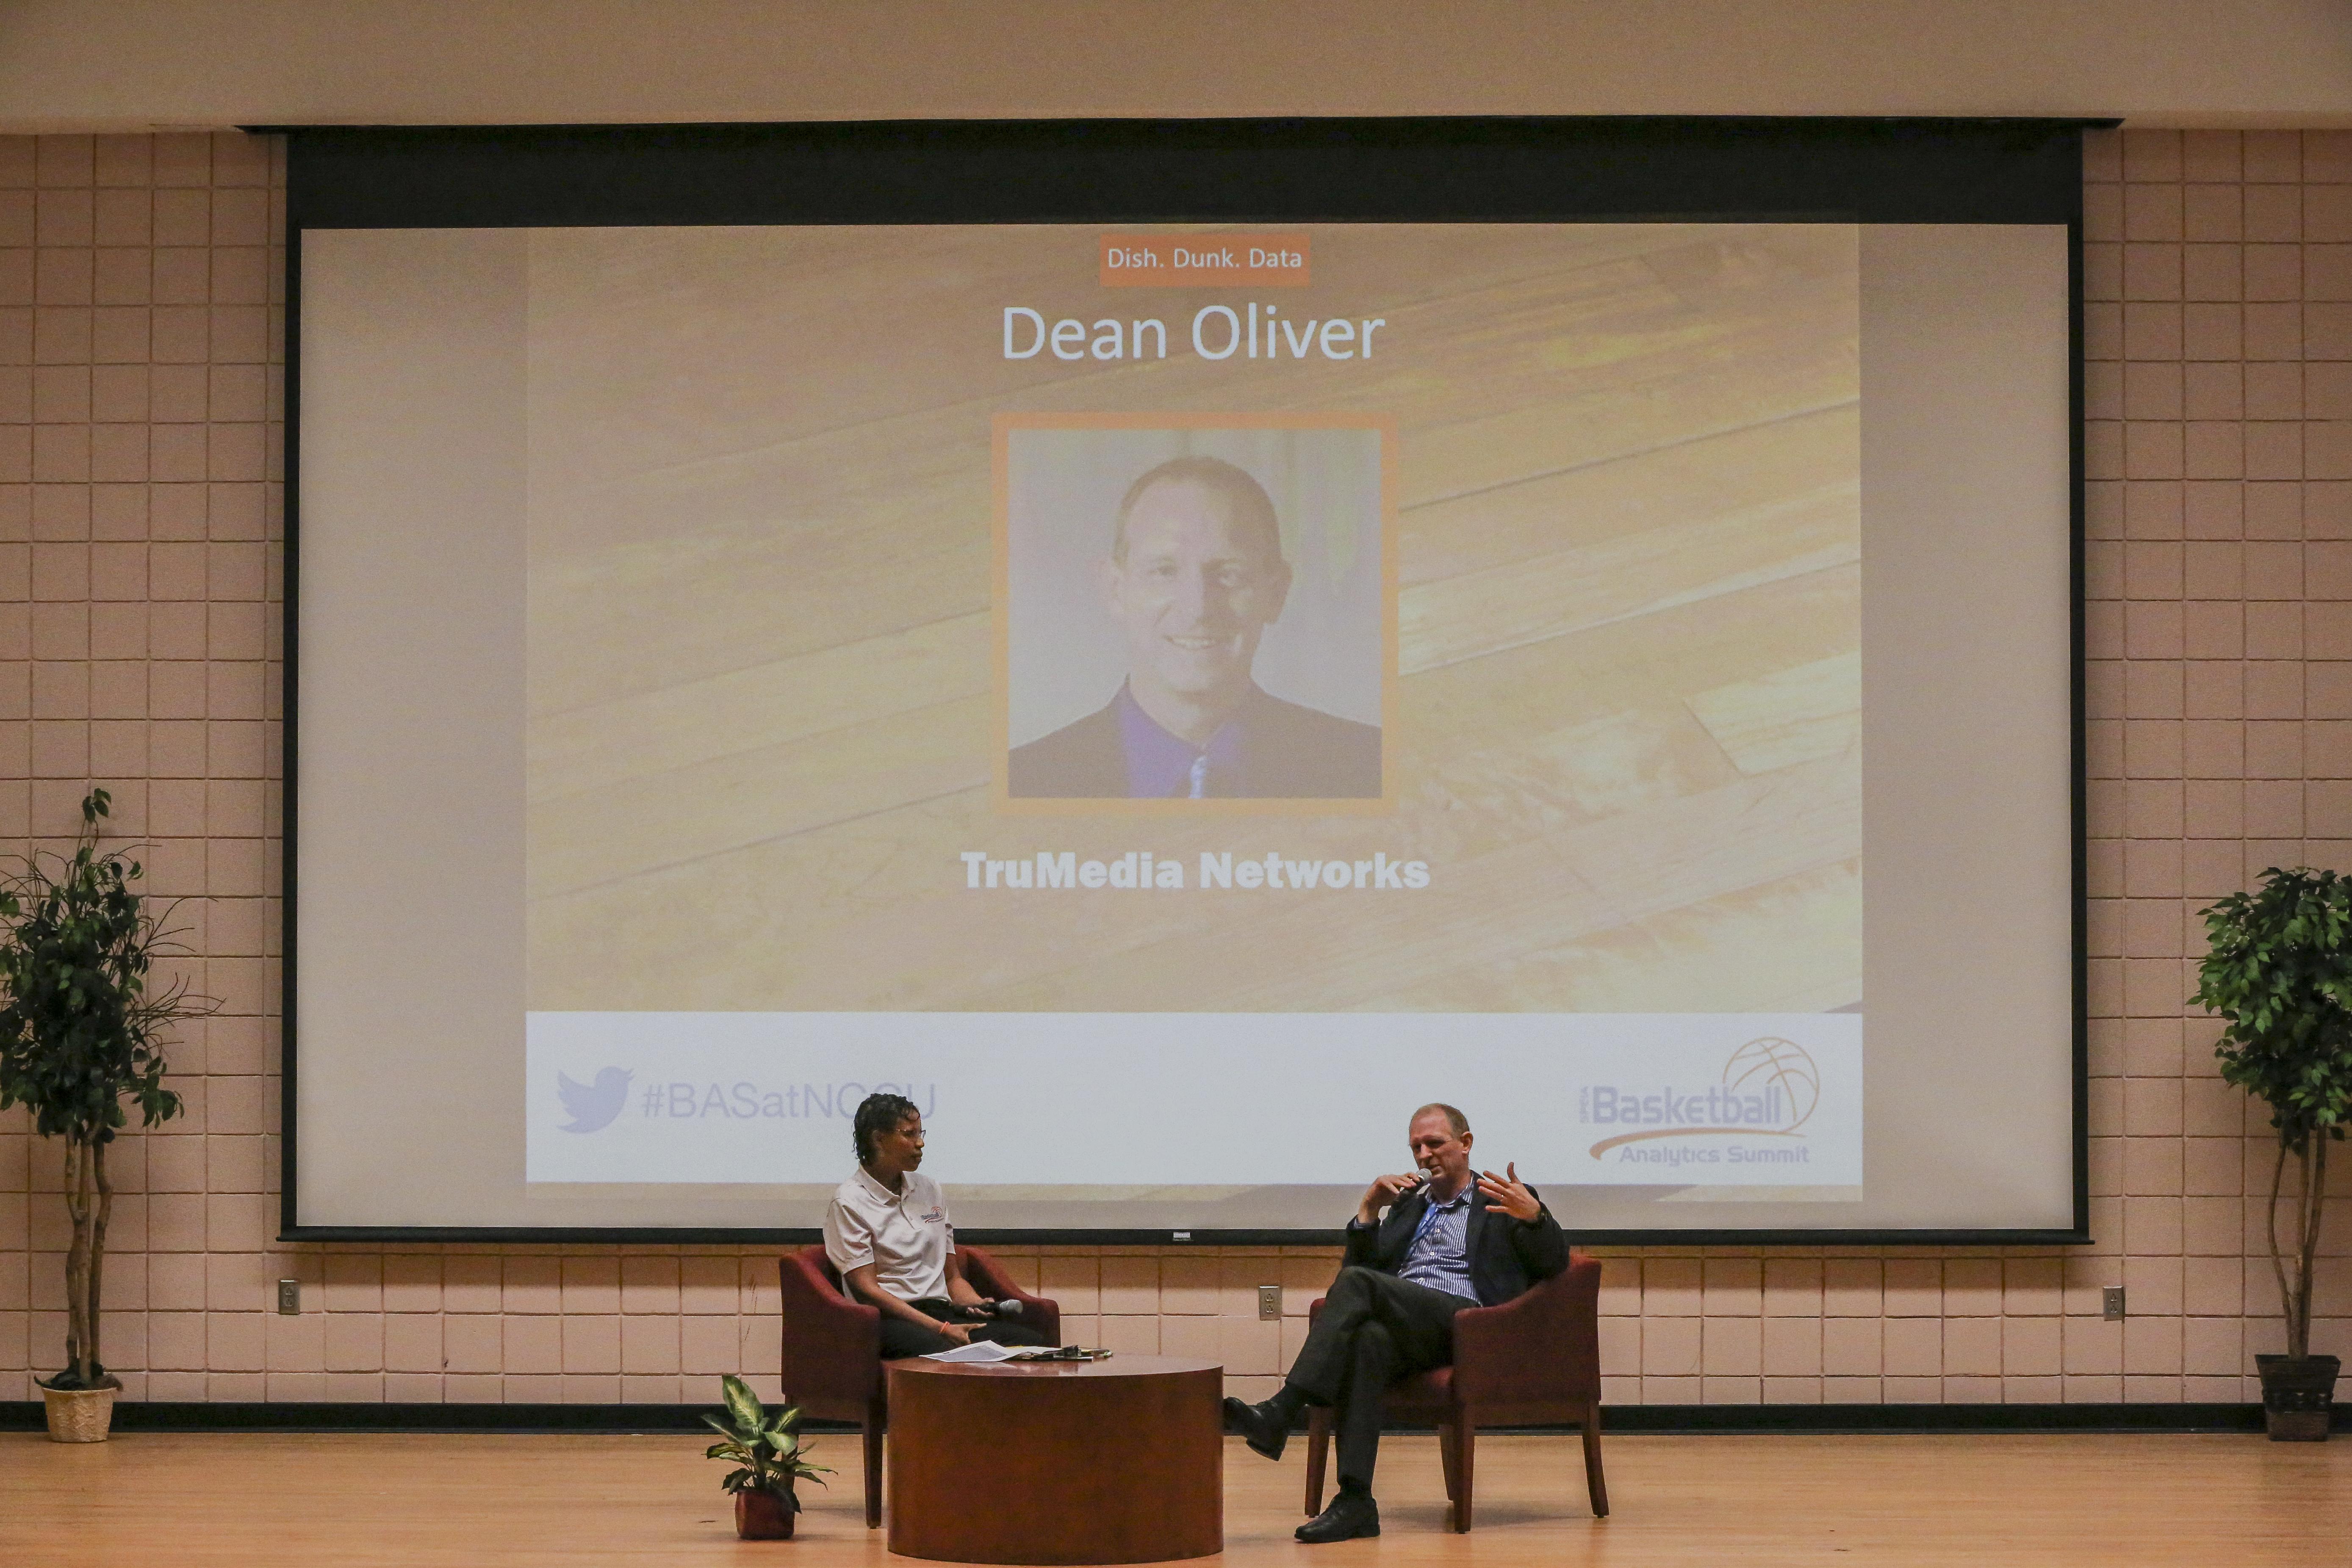 Dr. Dean Oliver and Dr. Stroman